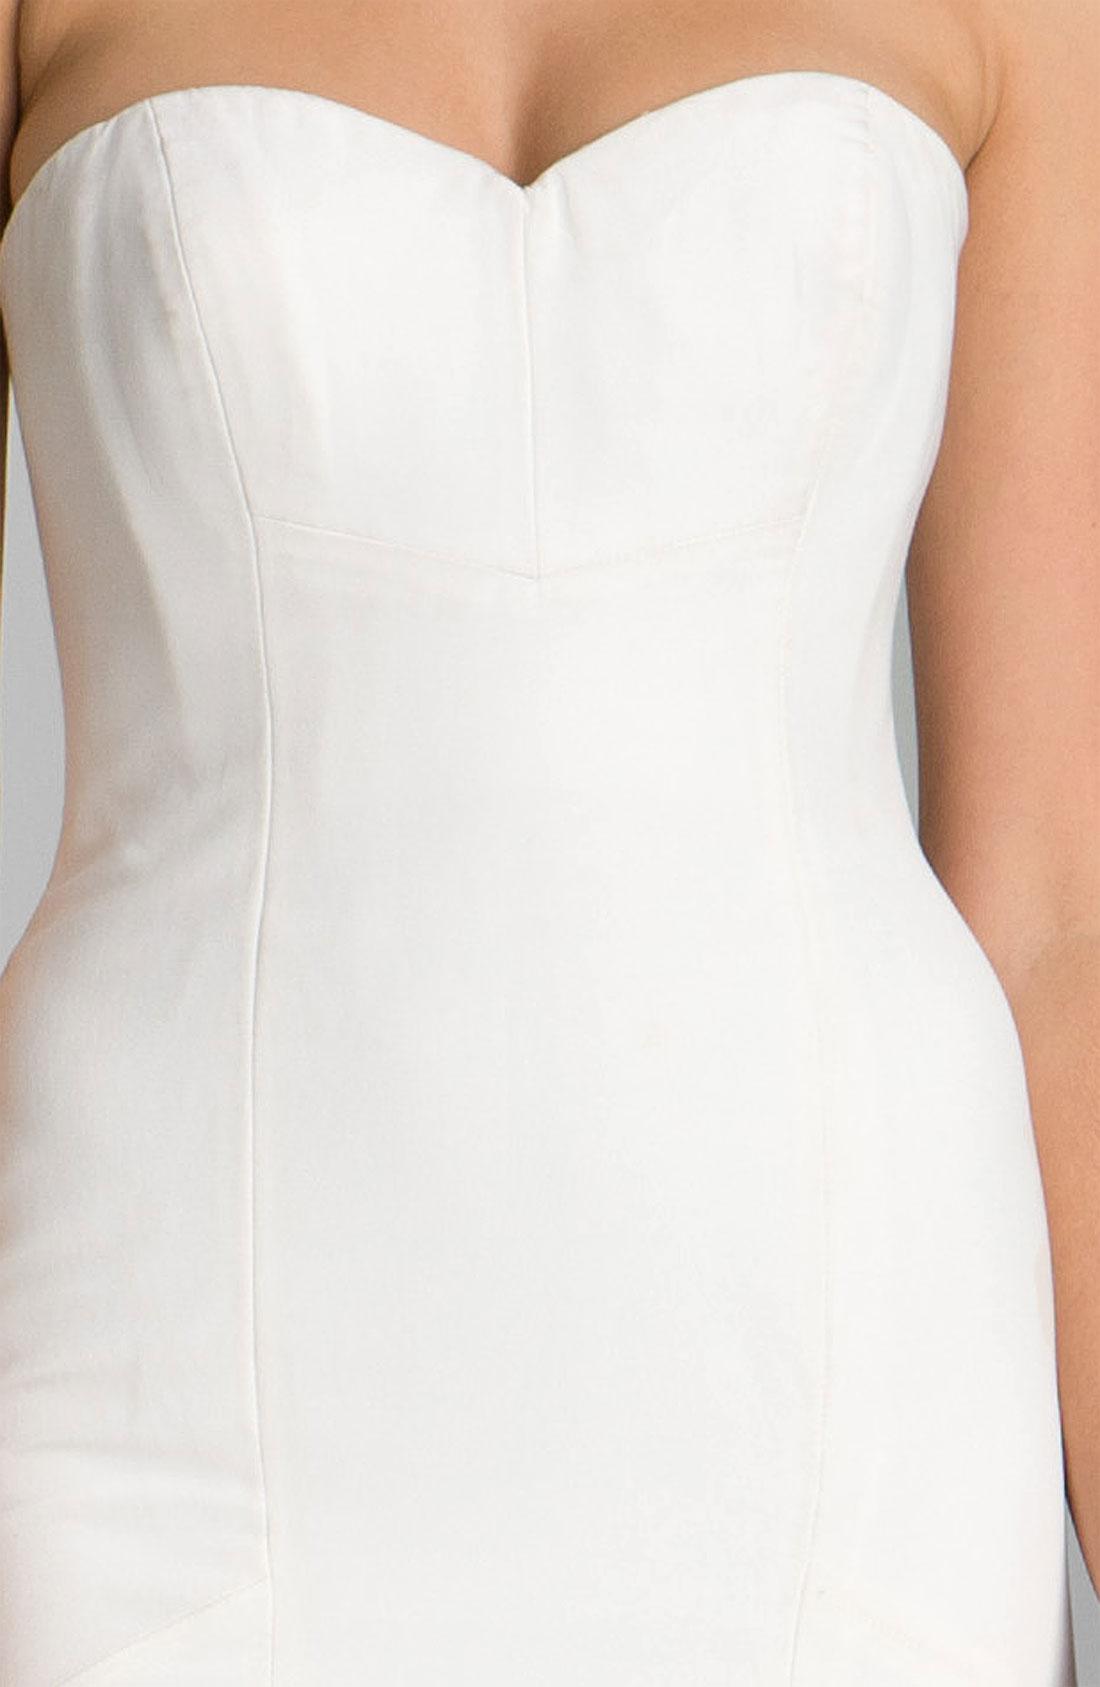 Lyst - Nicole miller Dakota Faille Trumpet Gown in White